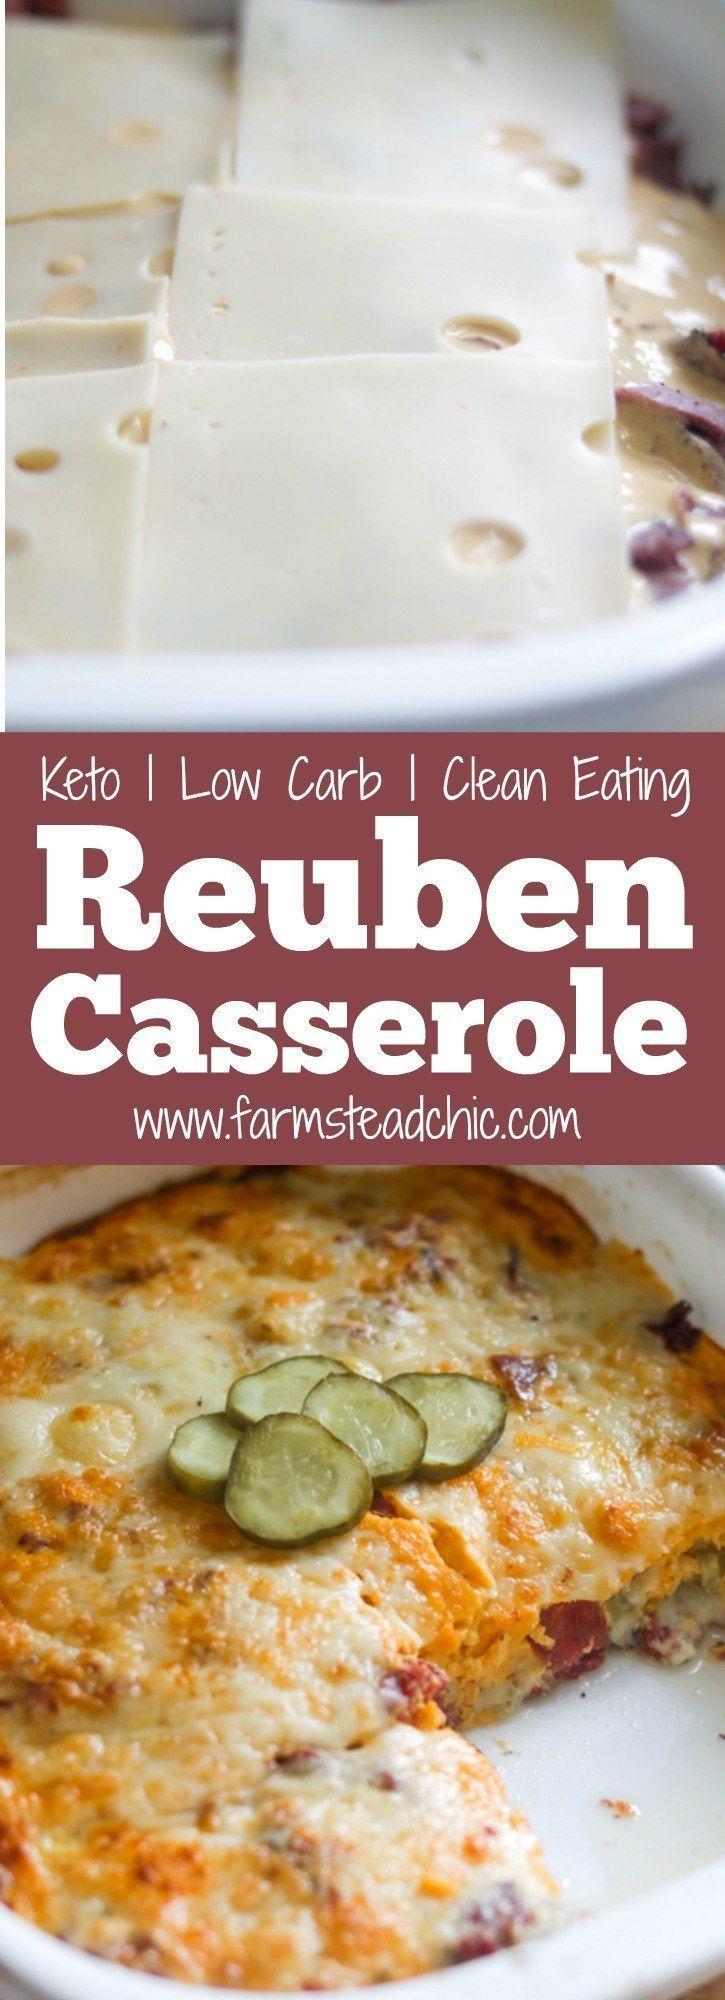 Low Carb, Keto Reuben Casserole, Grain Free, Gluten Free #ketocookierecipes